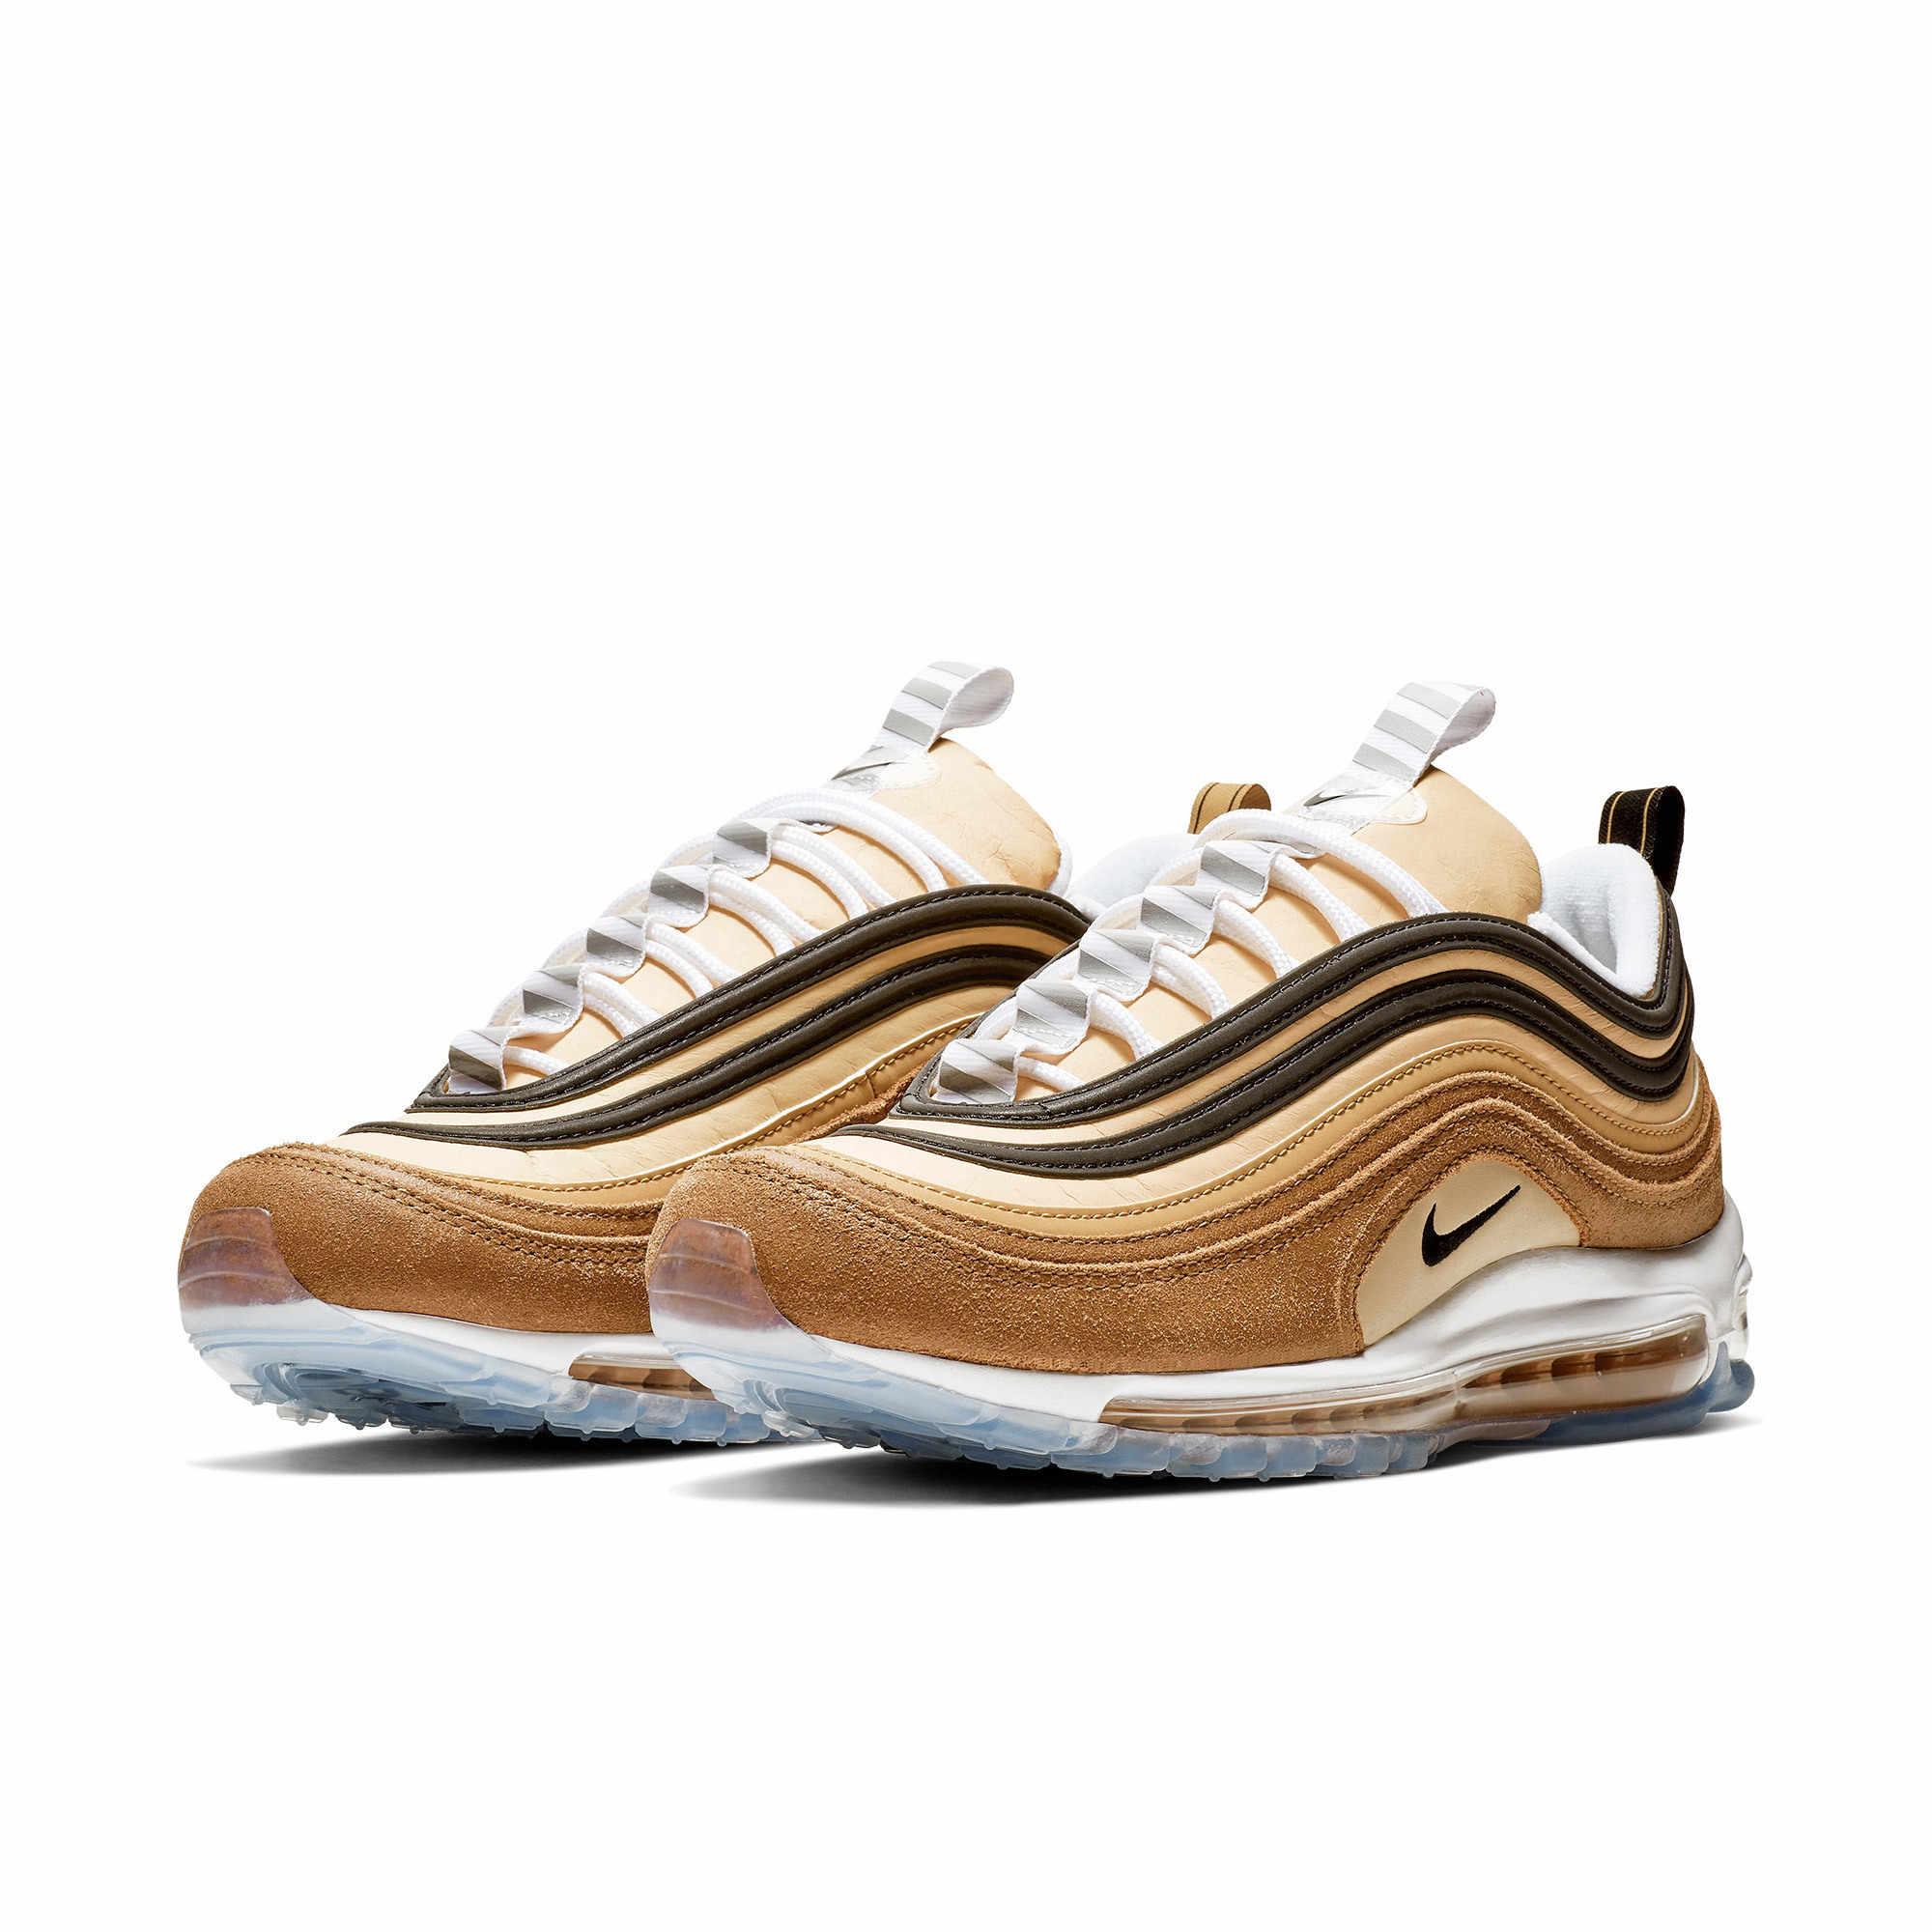 Nike официальный Air Max 97 Мужская беговая Обувь напольная, Удобная Нескользящая спортивная обувь #921826